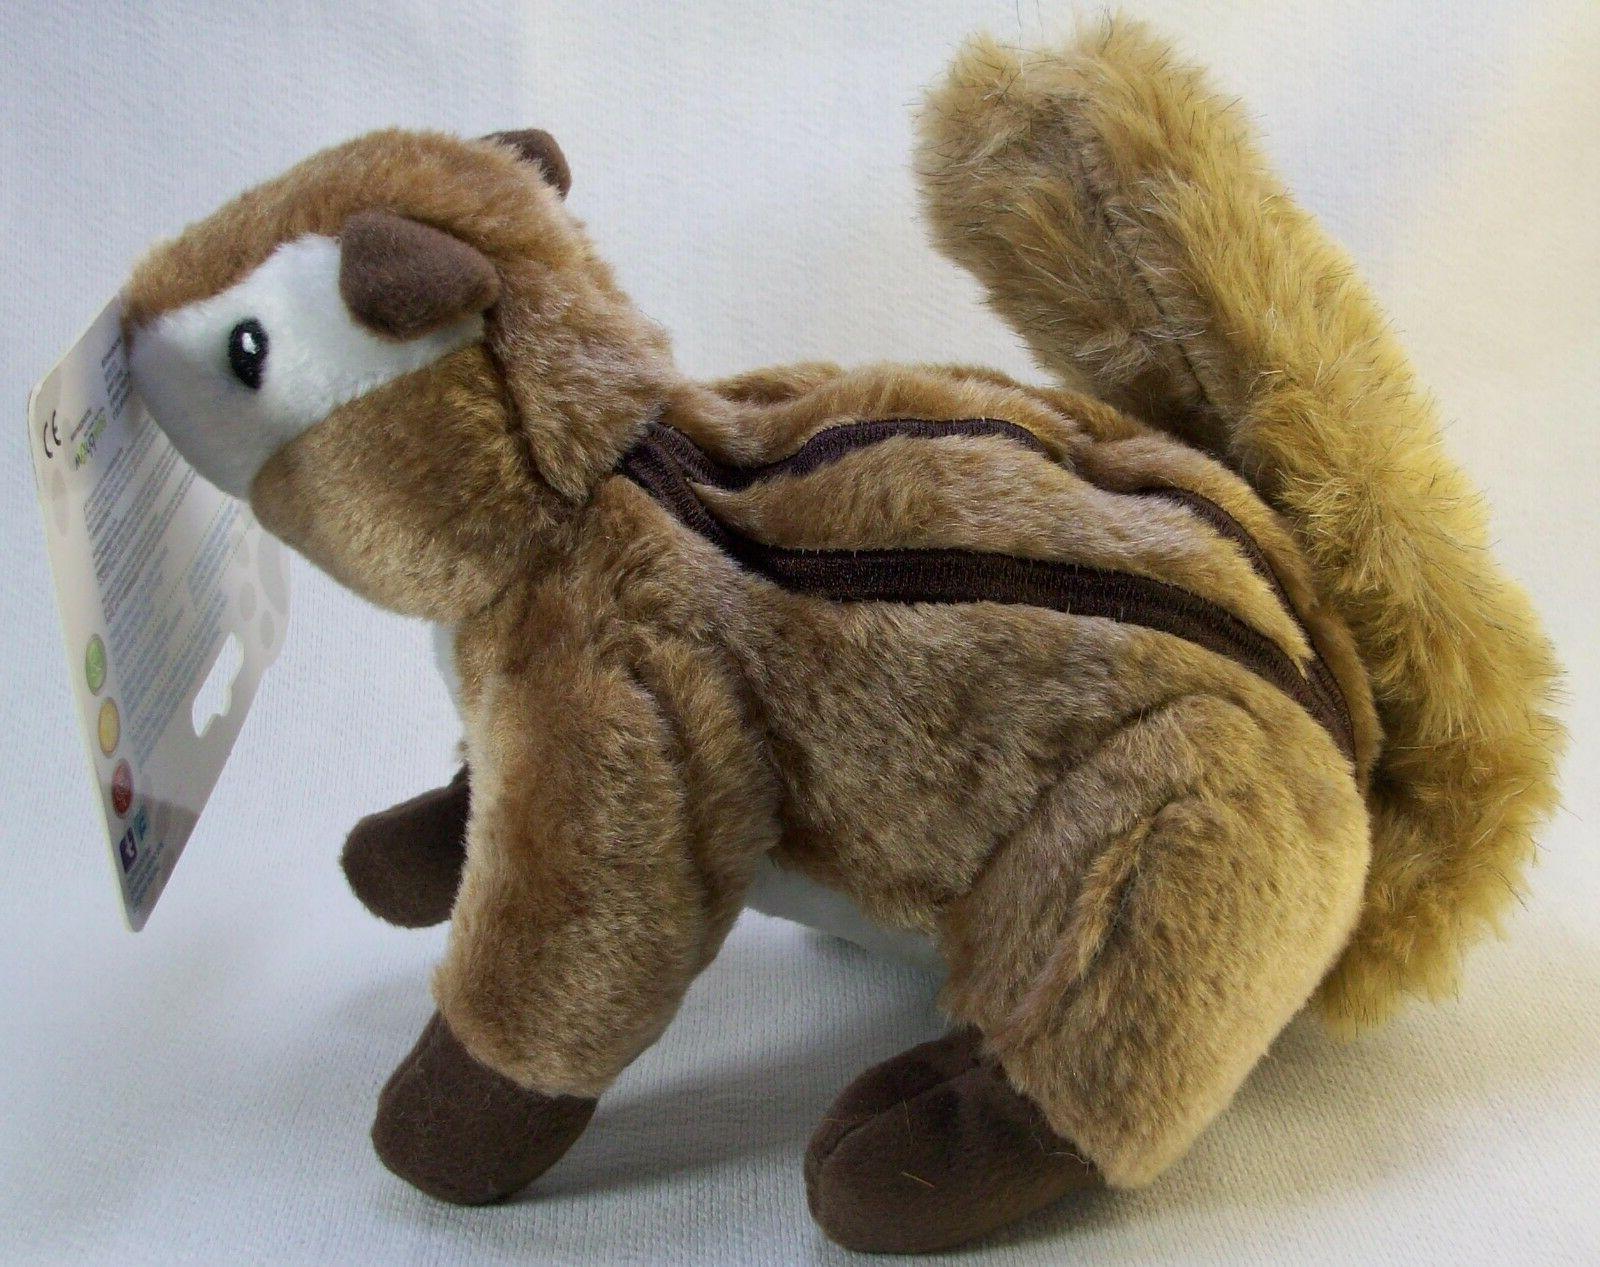 GoDog goDog Wildlife Dog Squeaker Toy Chew Guard Brand New